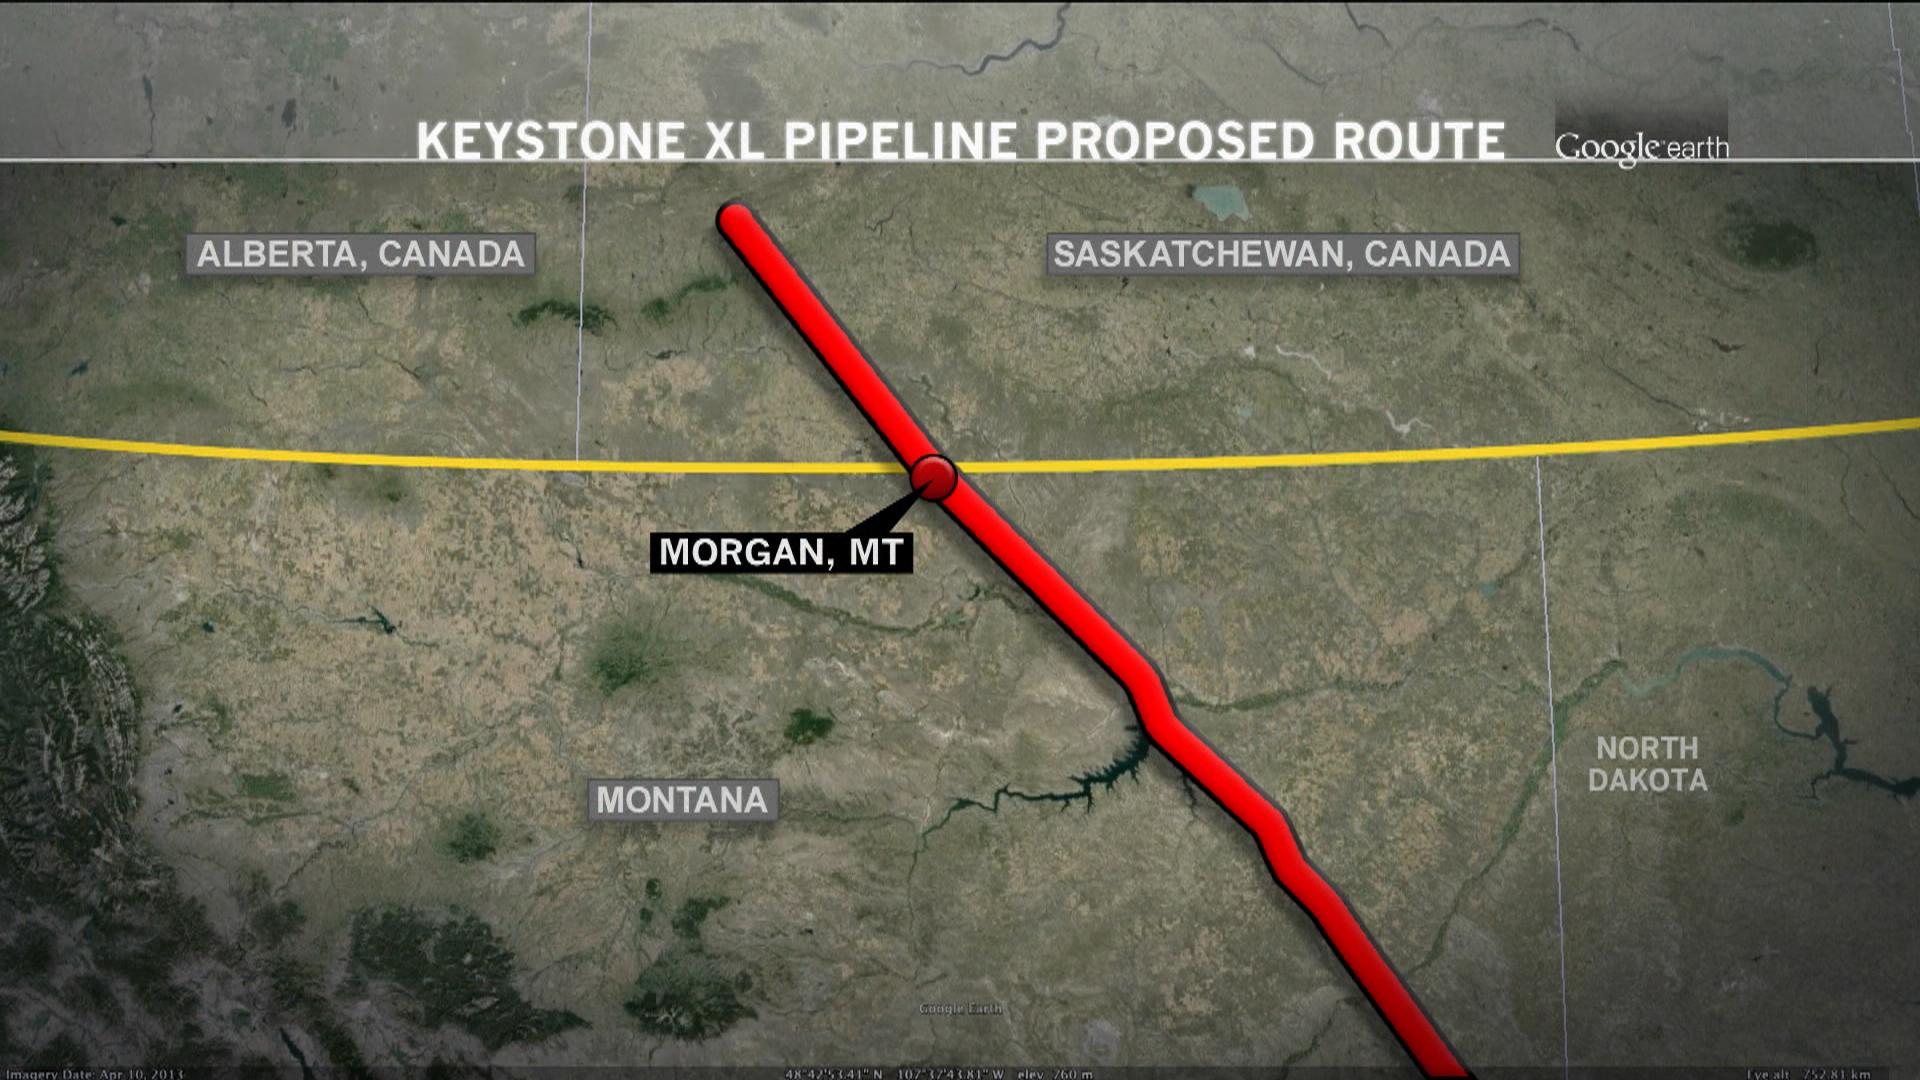 Ed: Keystone is energy independence, security